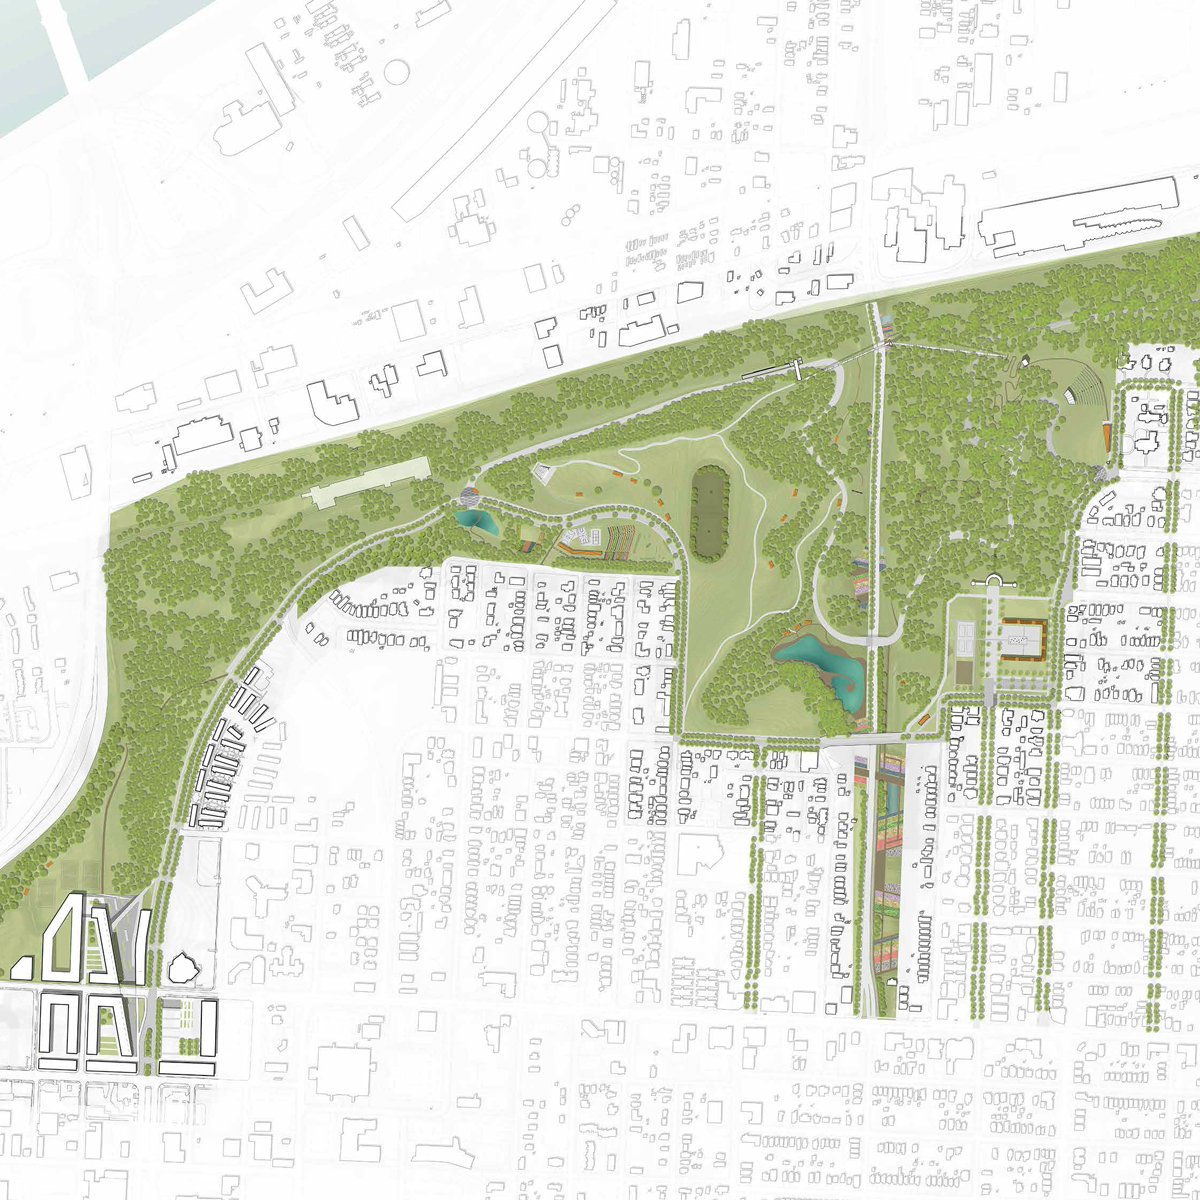 2014-2015 Studio Project: Kessler Park Vision Study